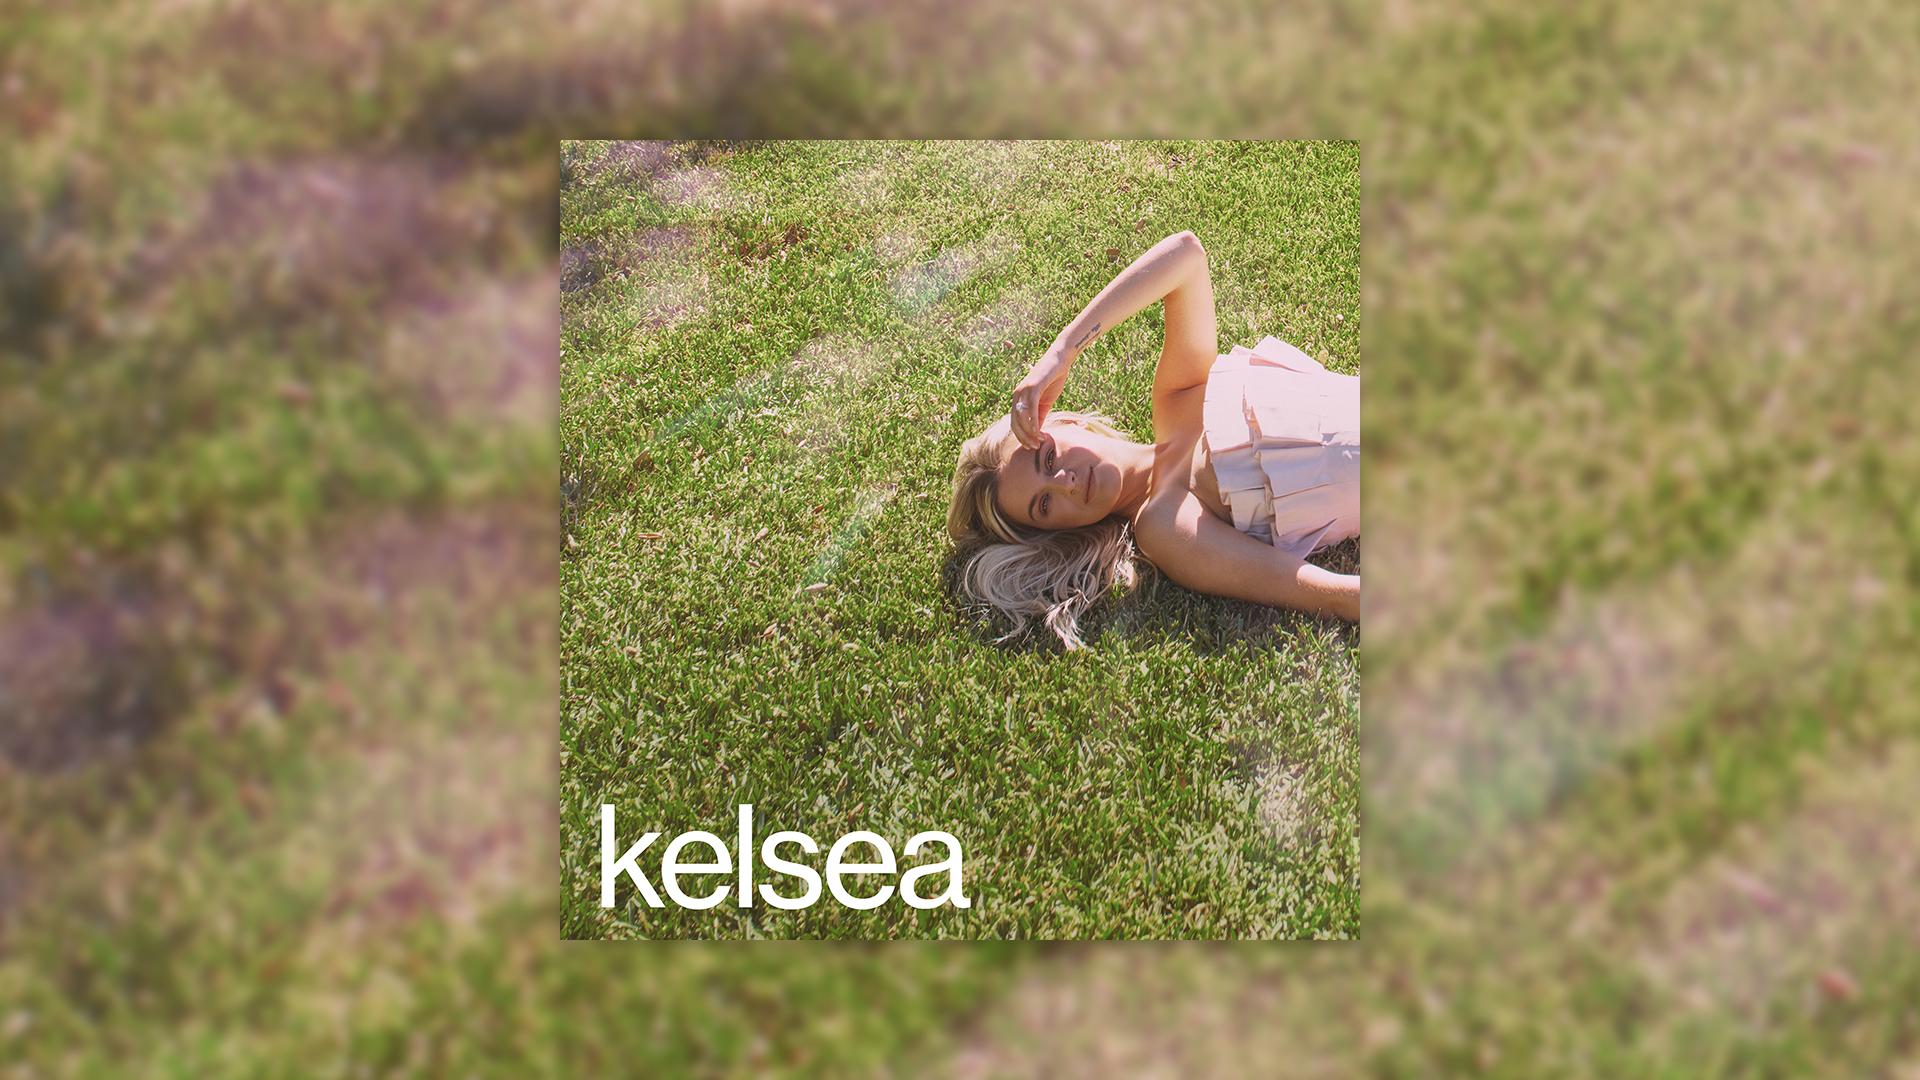 KELSEA BALLERINI kelsea | new album